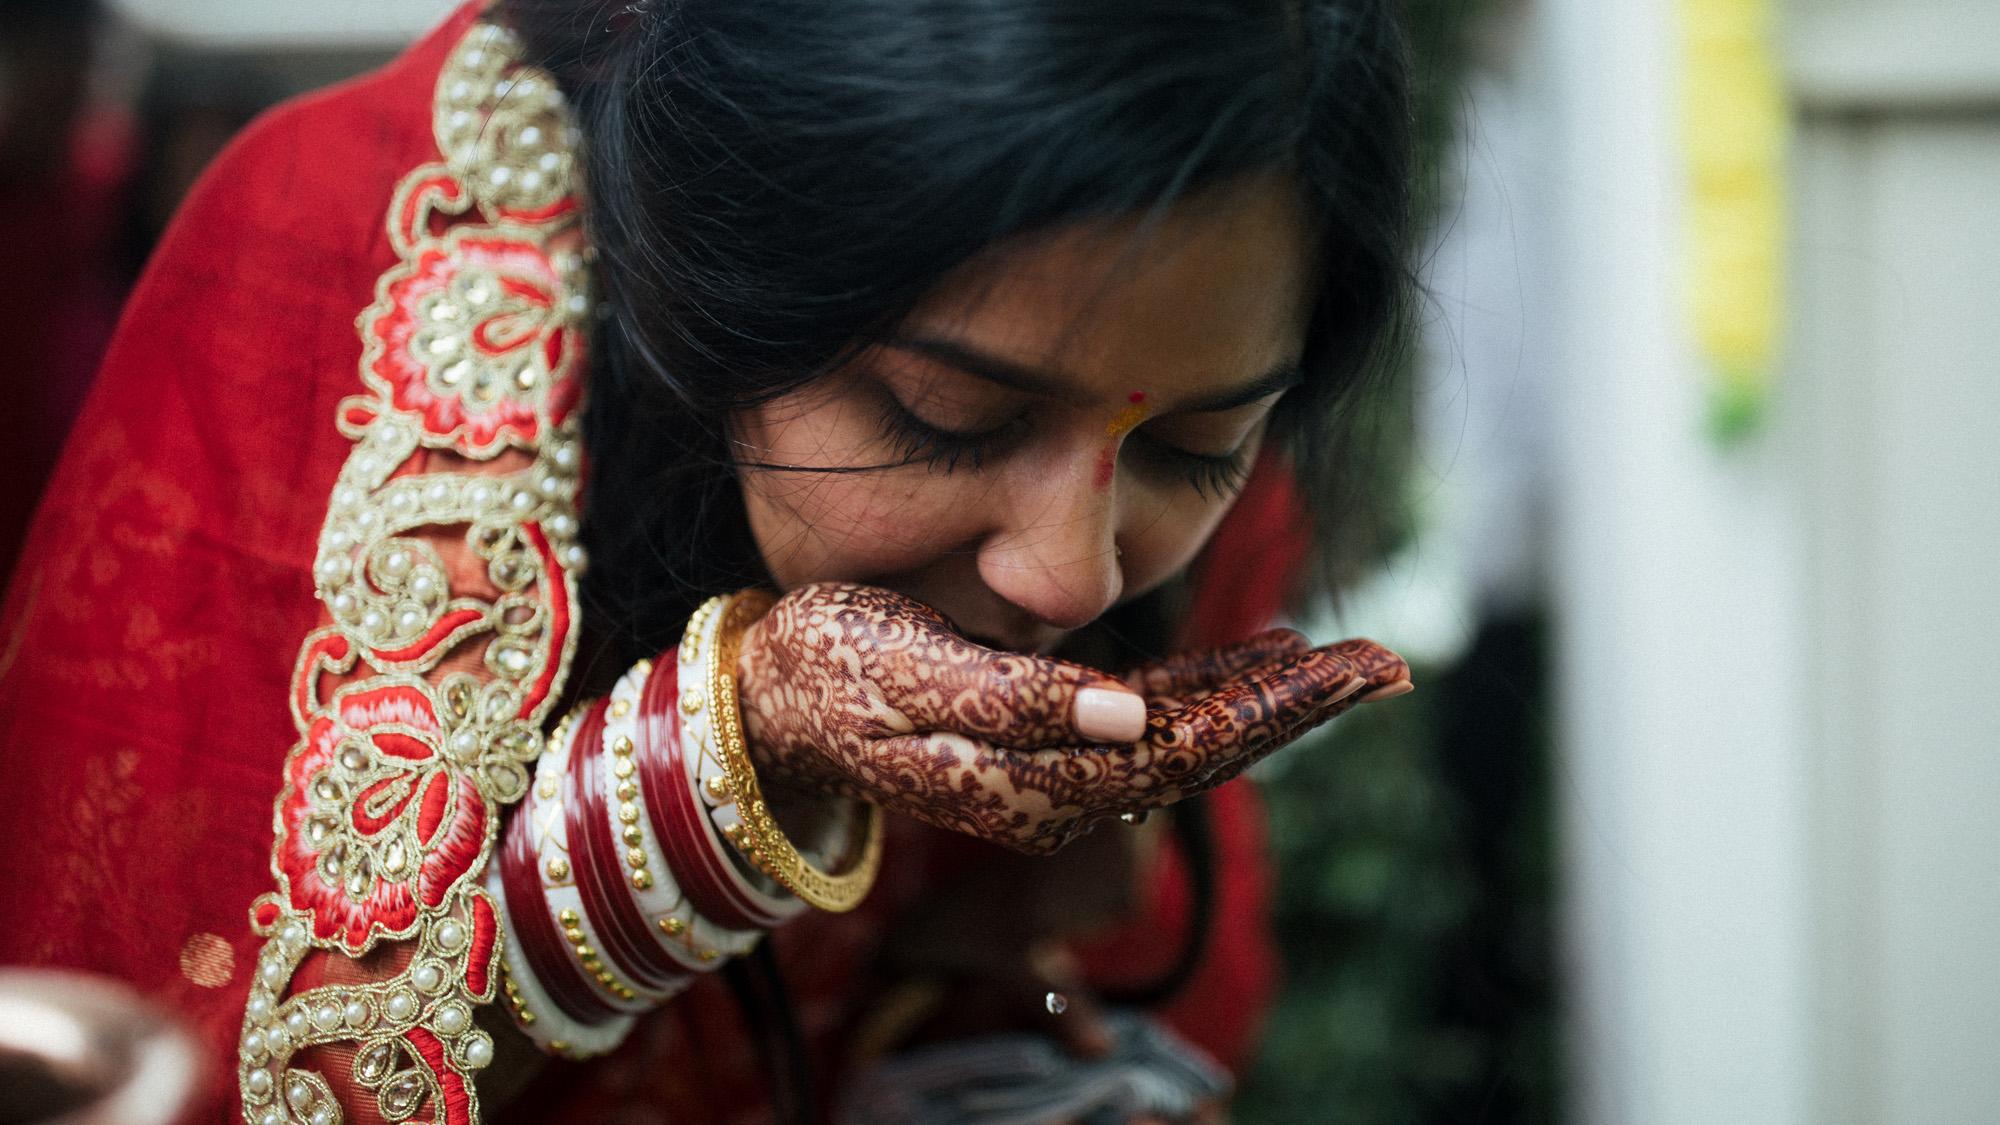 anu_maneesh_alec_vanderboom_Indian_wedding_photography-0204.jpg